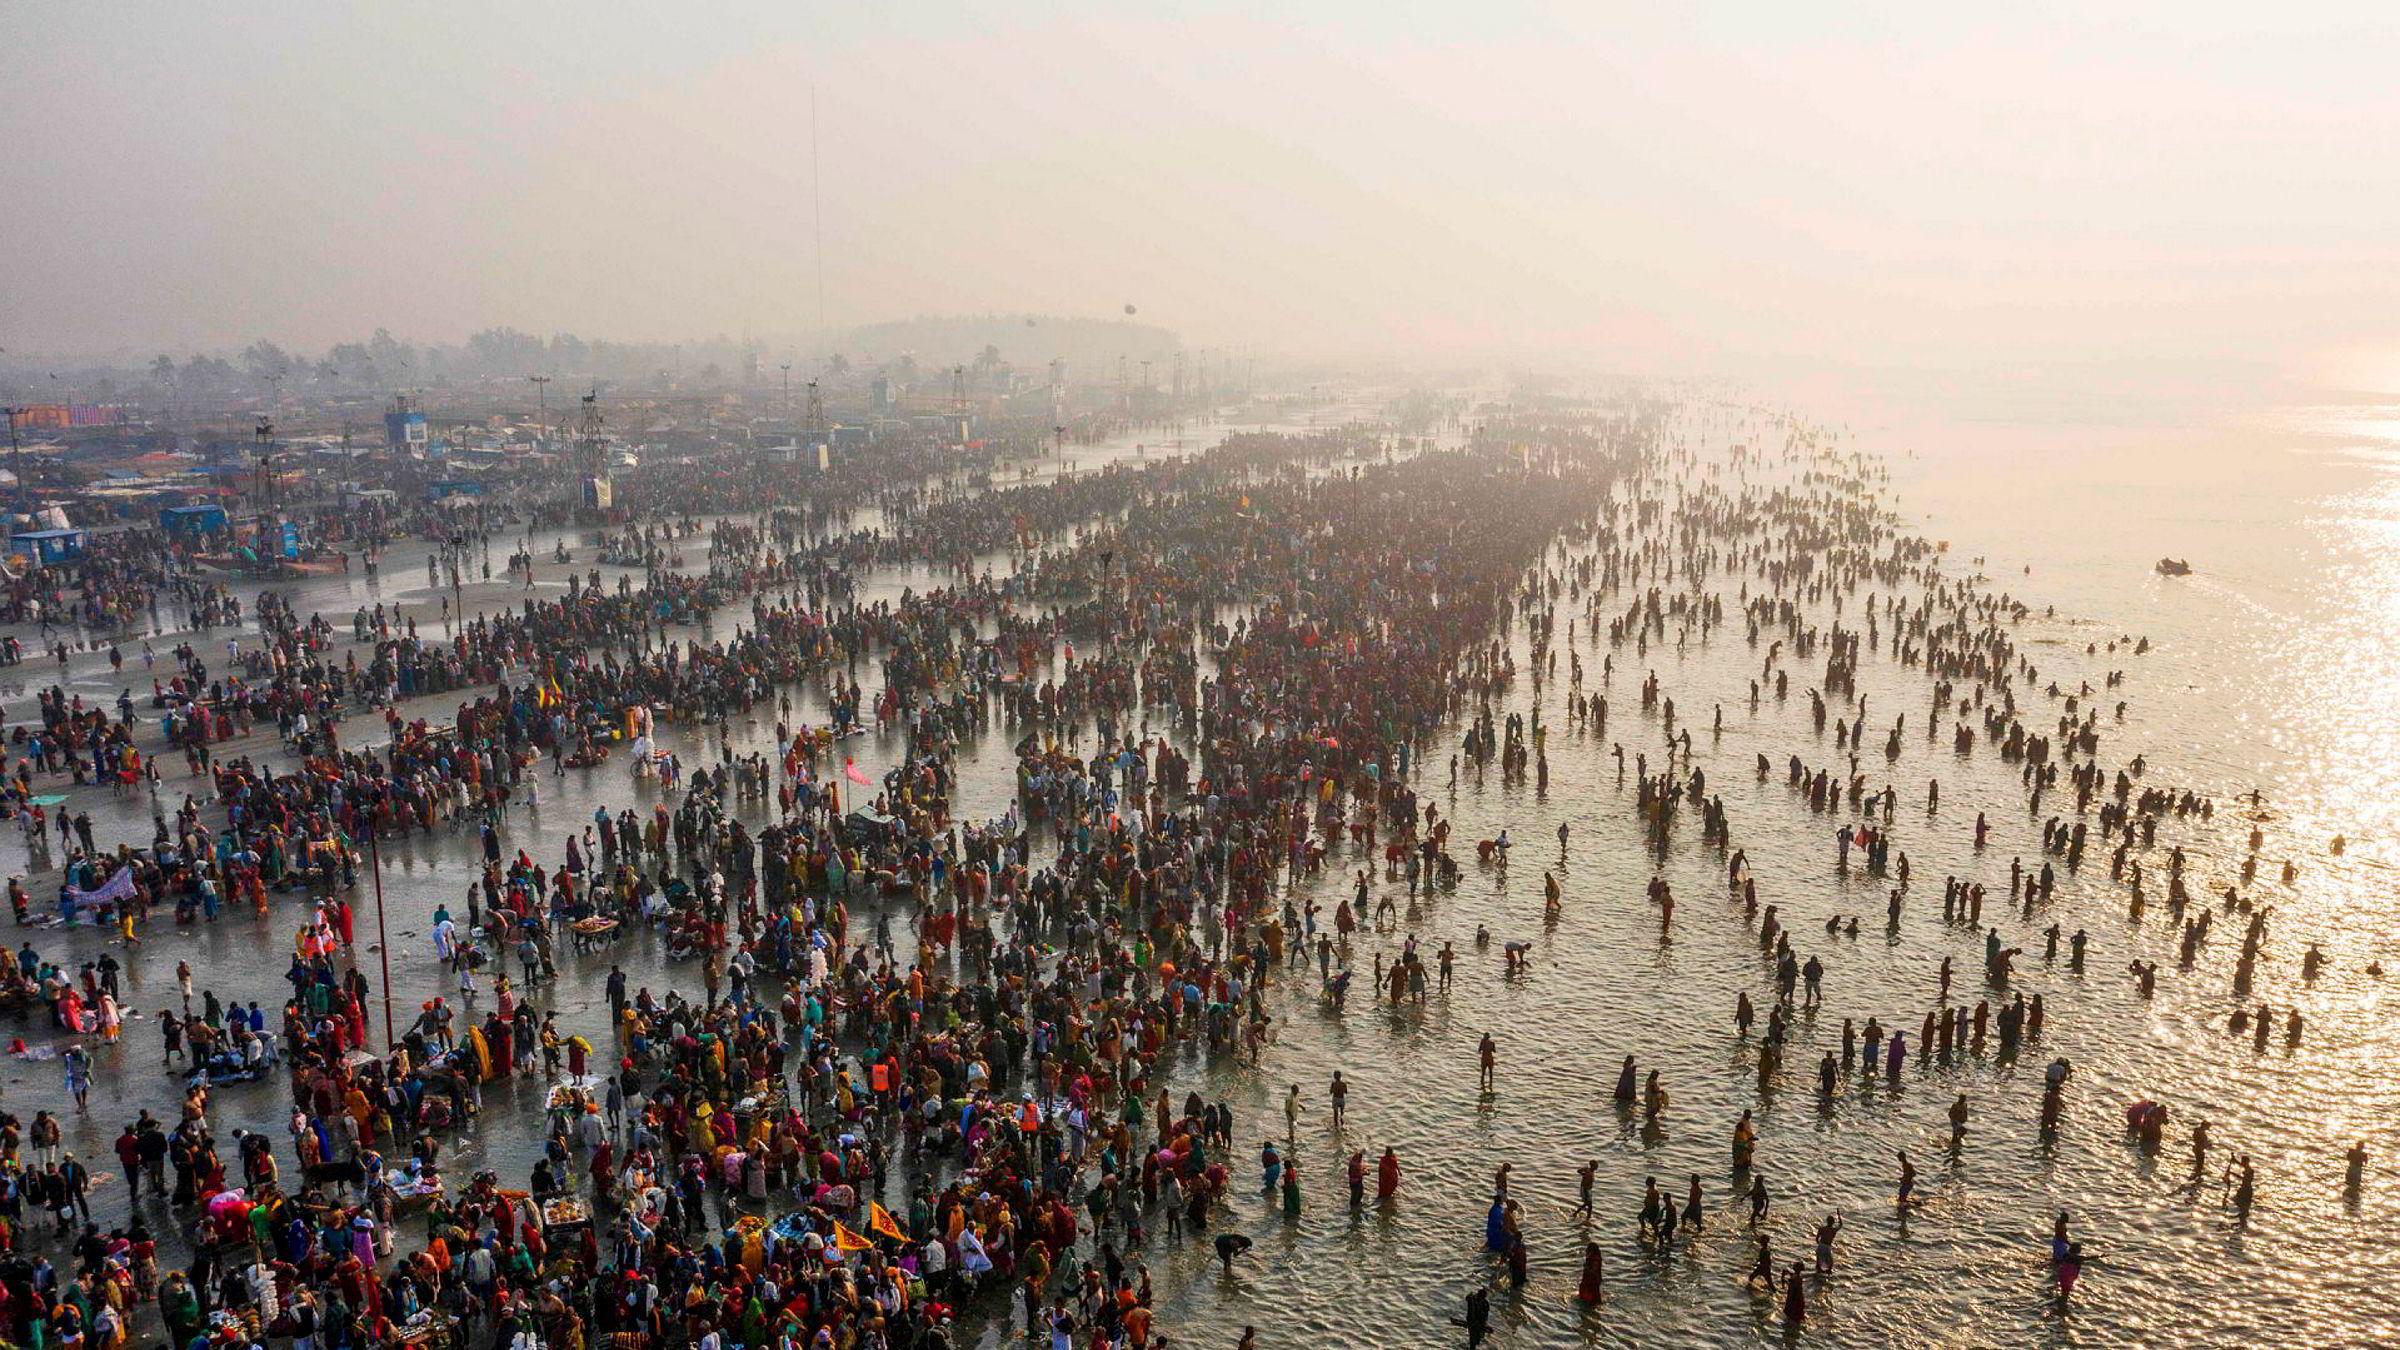 TOPSHOT – In this aerial photo taken on January 14, 2020, Hindu devoteks gather to take a holy dipp in the Bay of Bengal during the Gangasagar Mela, at Sagar Island, some 150 kilometers south of Kolkata. (Photo by XAVIER GALIANA / AFP) ---